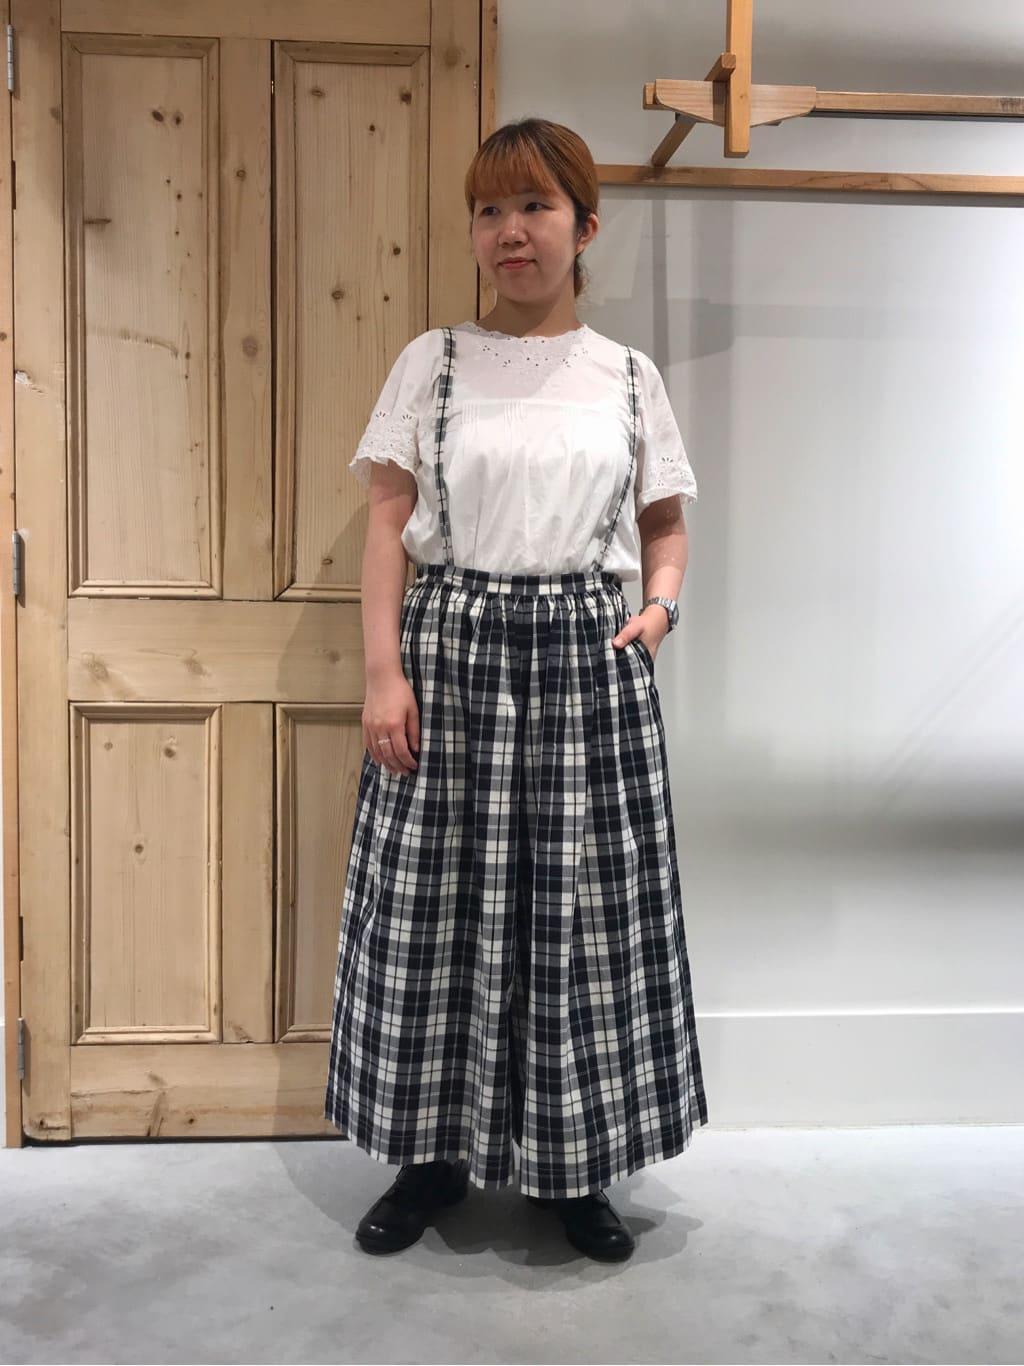 Malle chambre de charme 調布パルコ 身長:155cm 2021.07.21